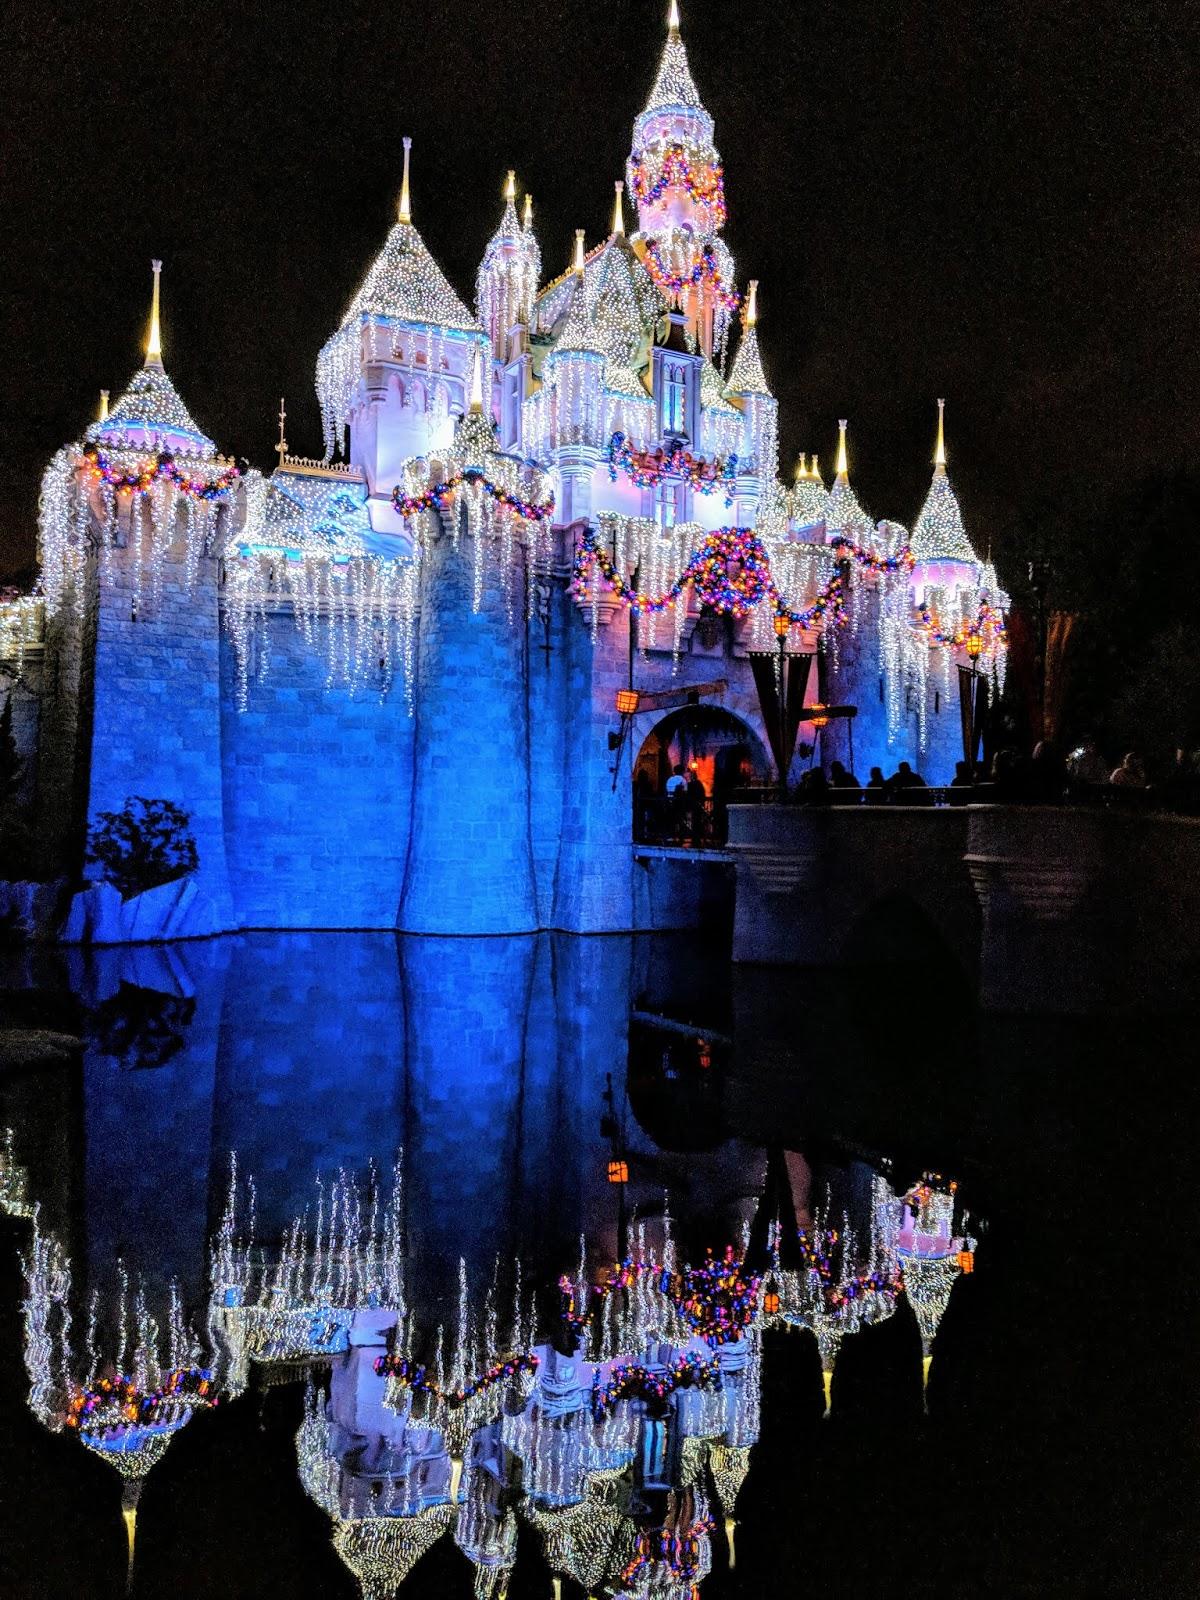 Celebrate The Holiday Season At The Disneyland Resort Starting